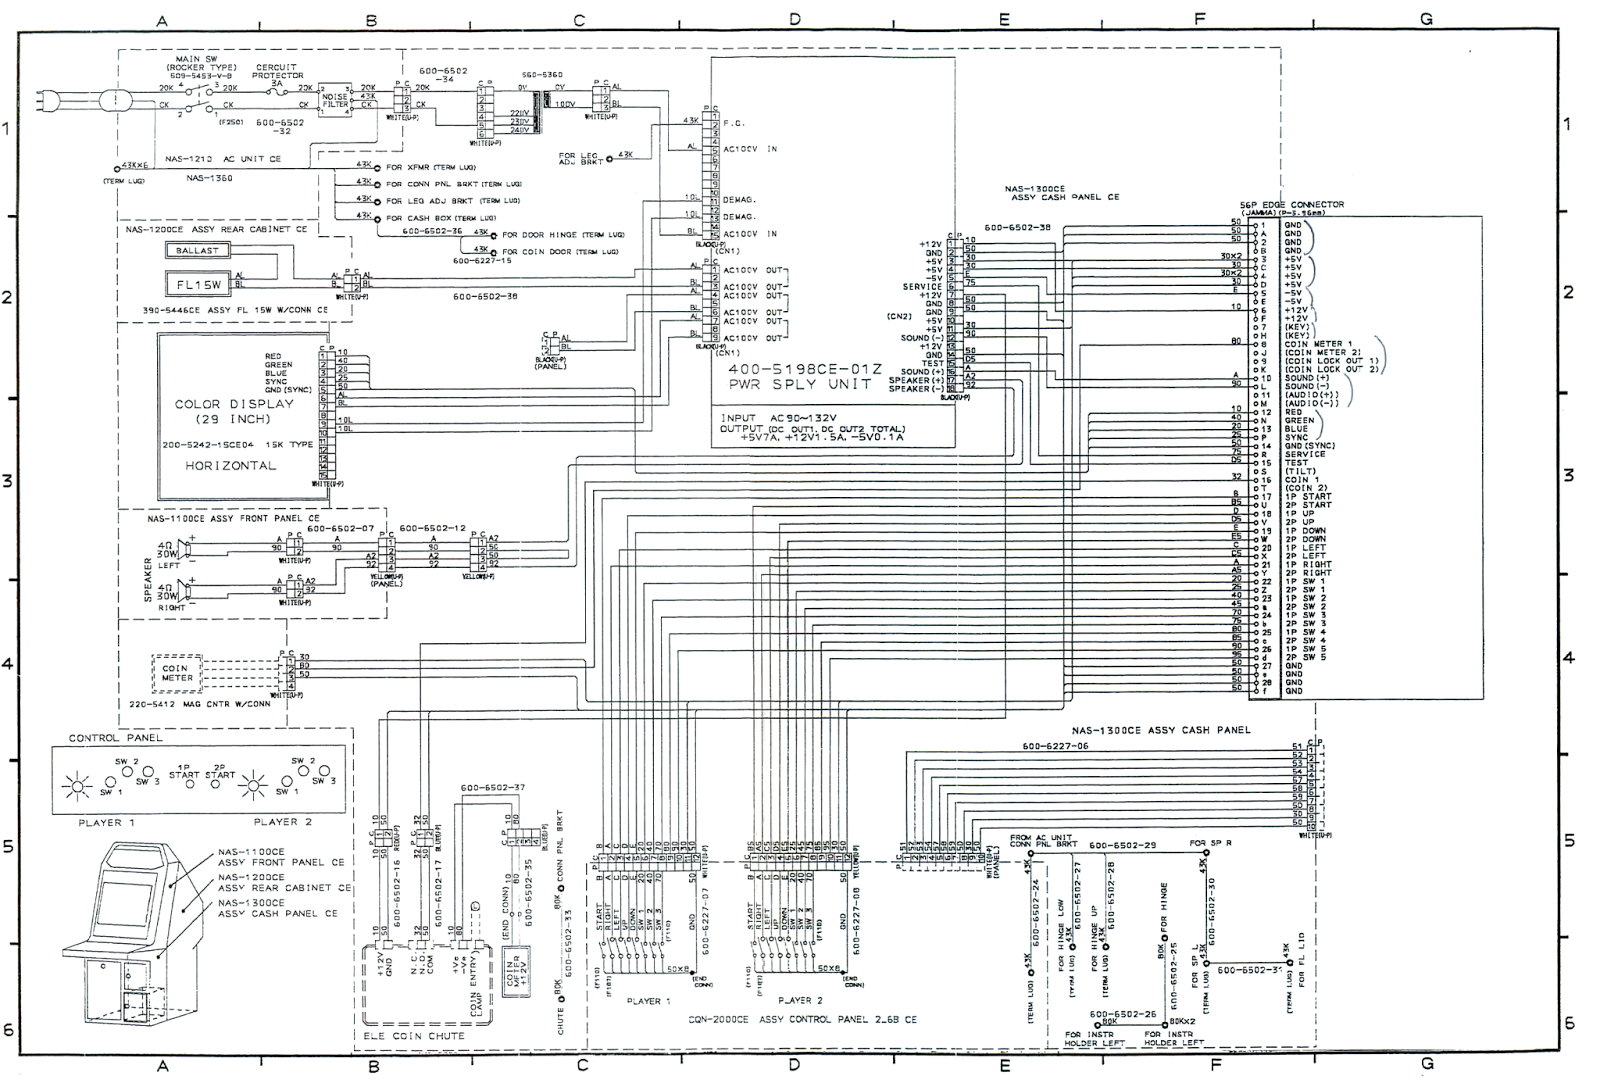 Blitz Power Meter Wiring Diagram Commando Remote Start Kick Harness On New Astro City Cgcc Ca